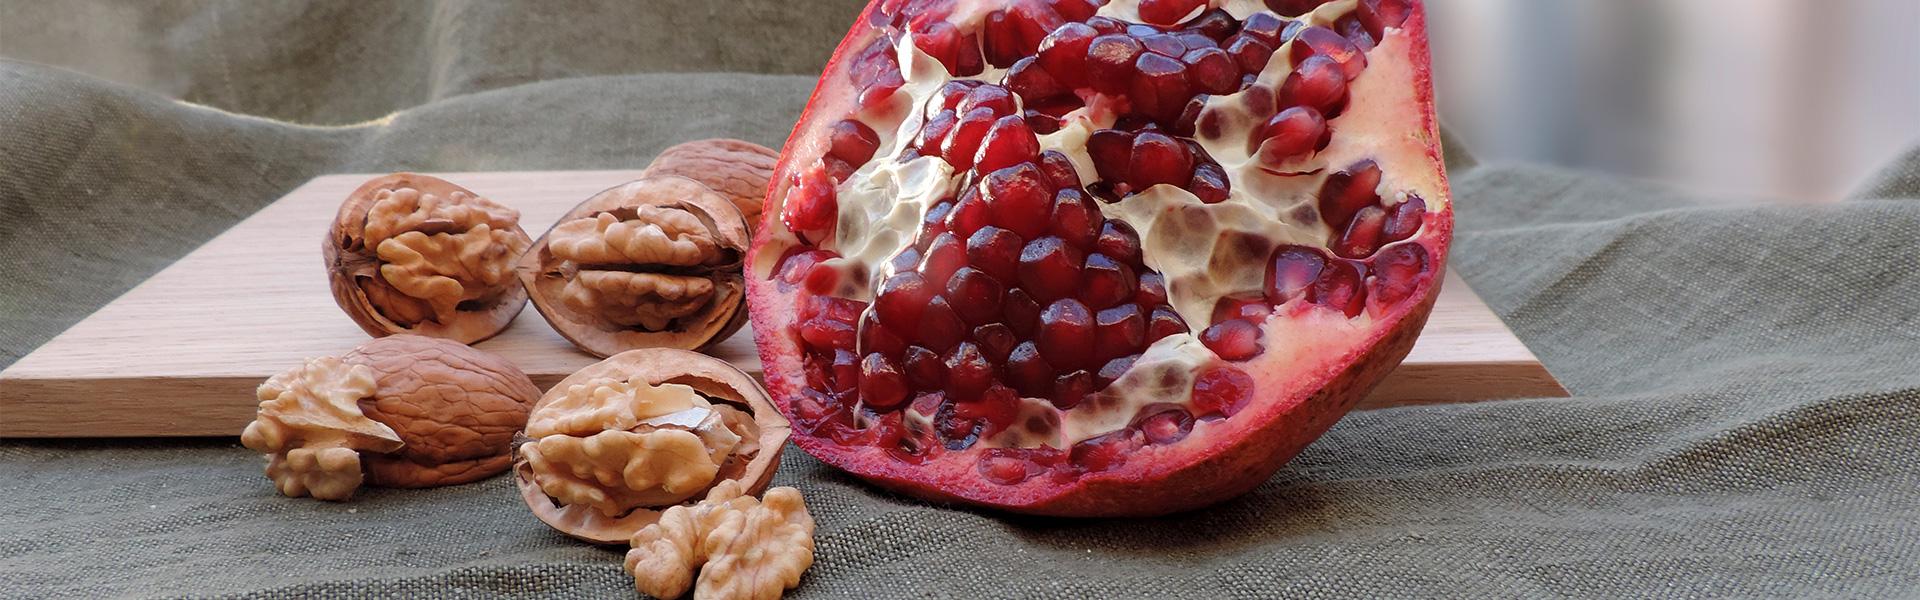 Walnüsse & Granatapfel